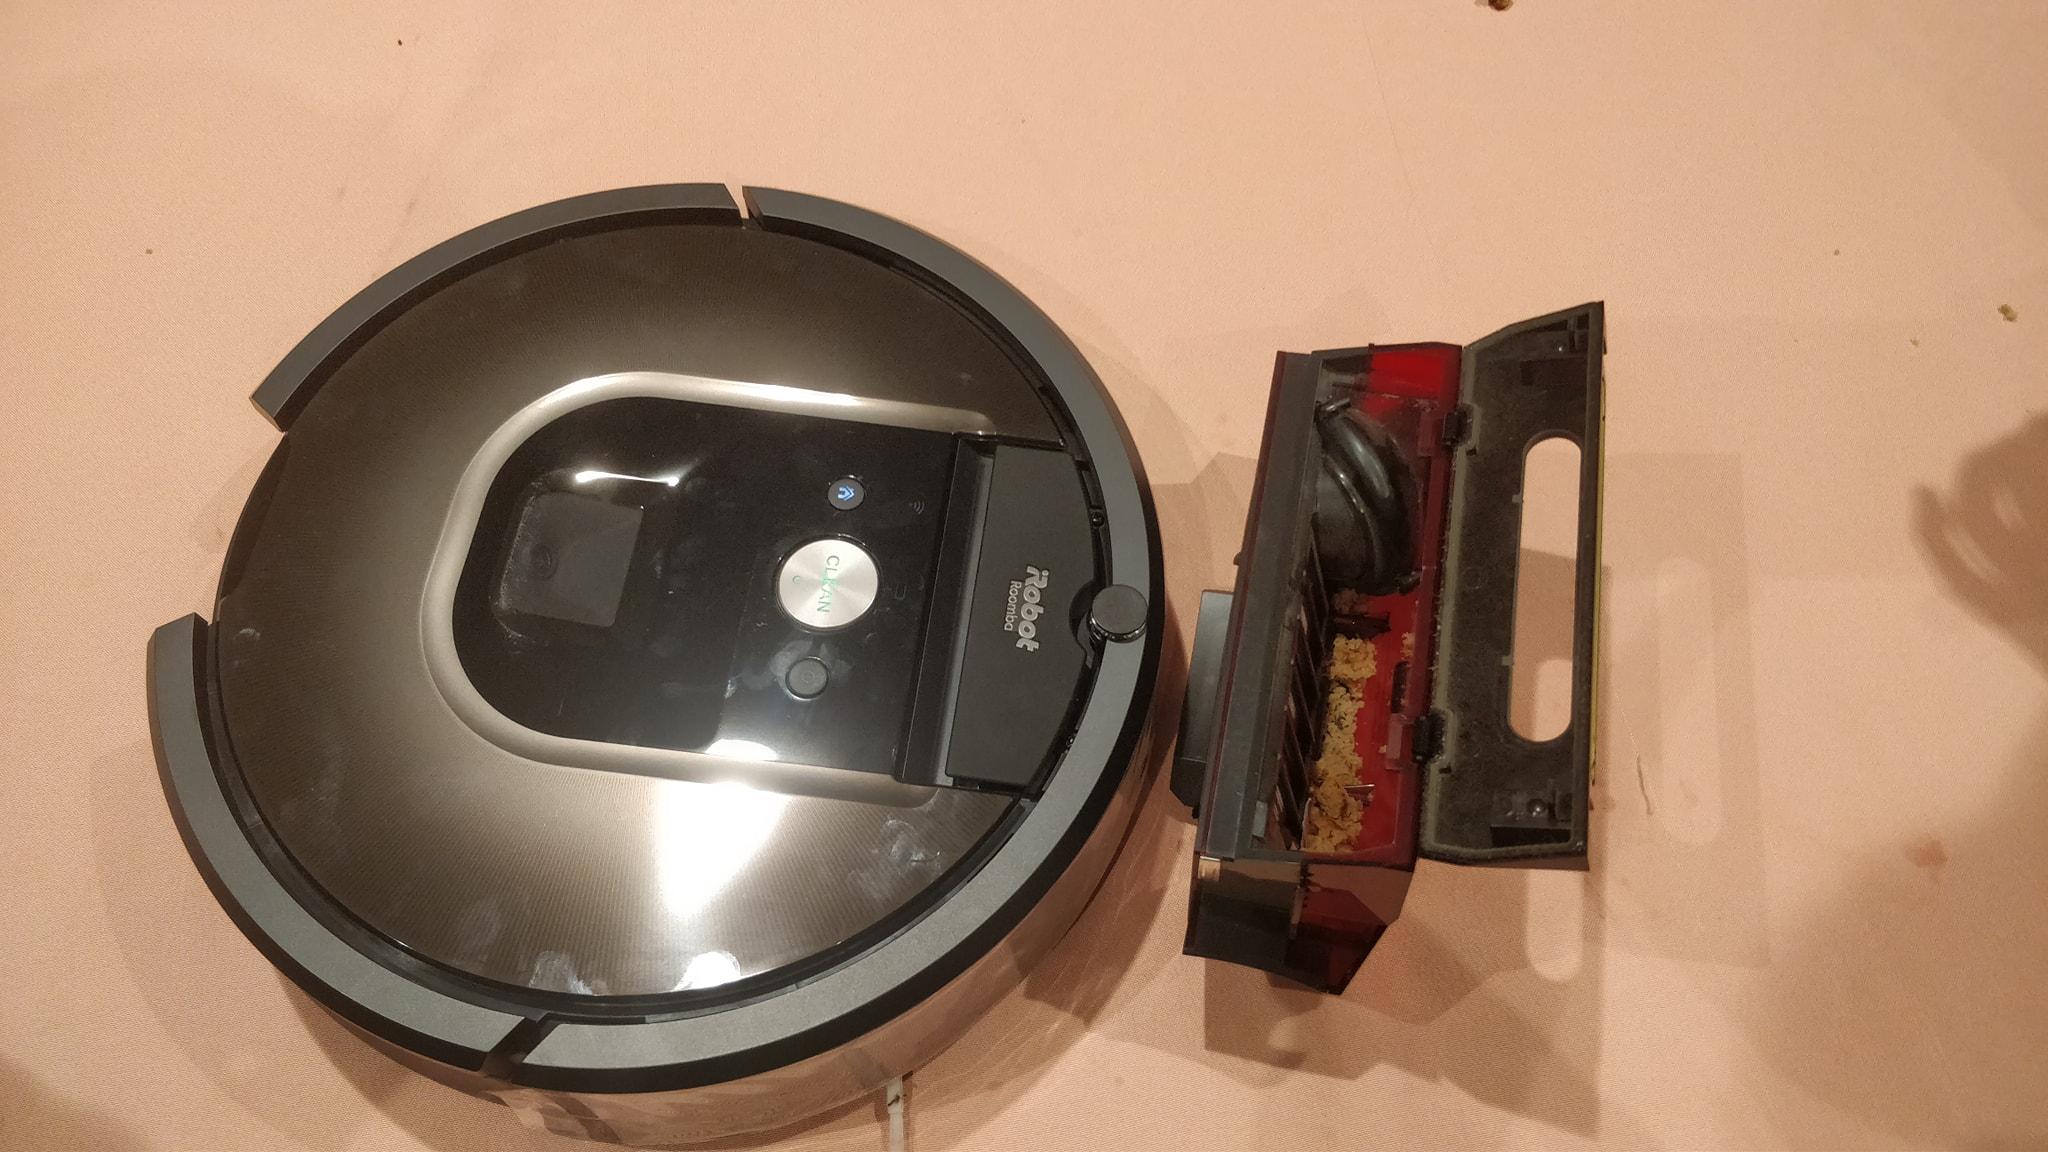 Roomba 900 series Vaccum Robots